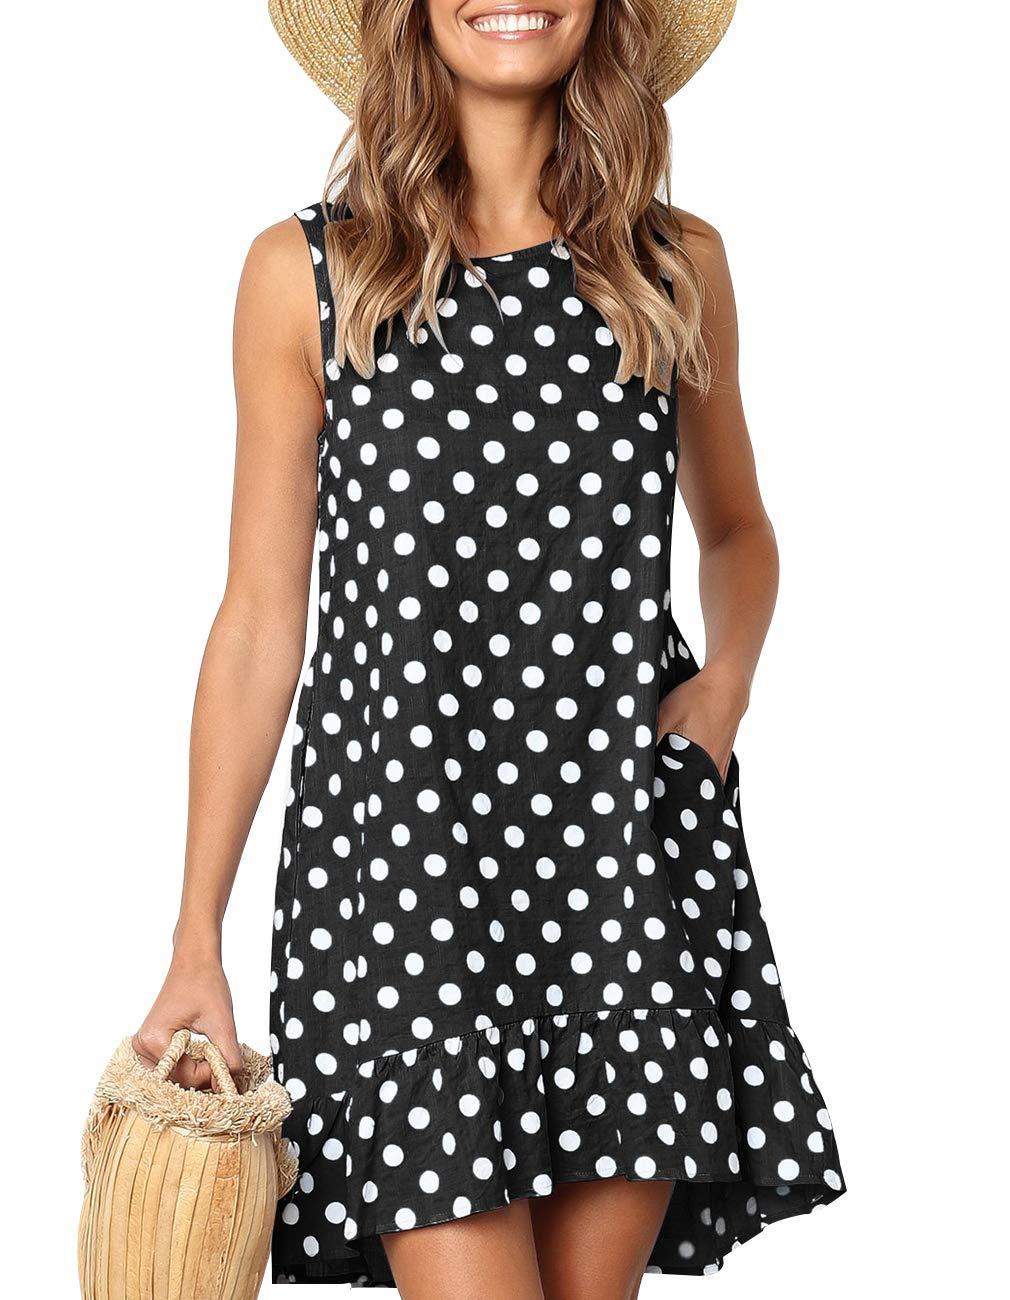 Women's Sleeveless Swing T-Shirt Dress Casual Loose Ruffle Polka Dot Printed Sundress with Pockets (Black, XL)